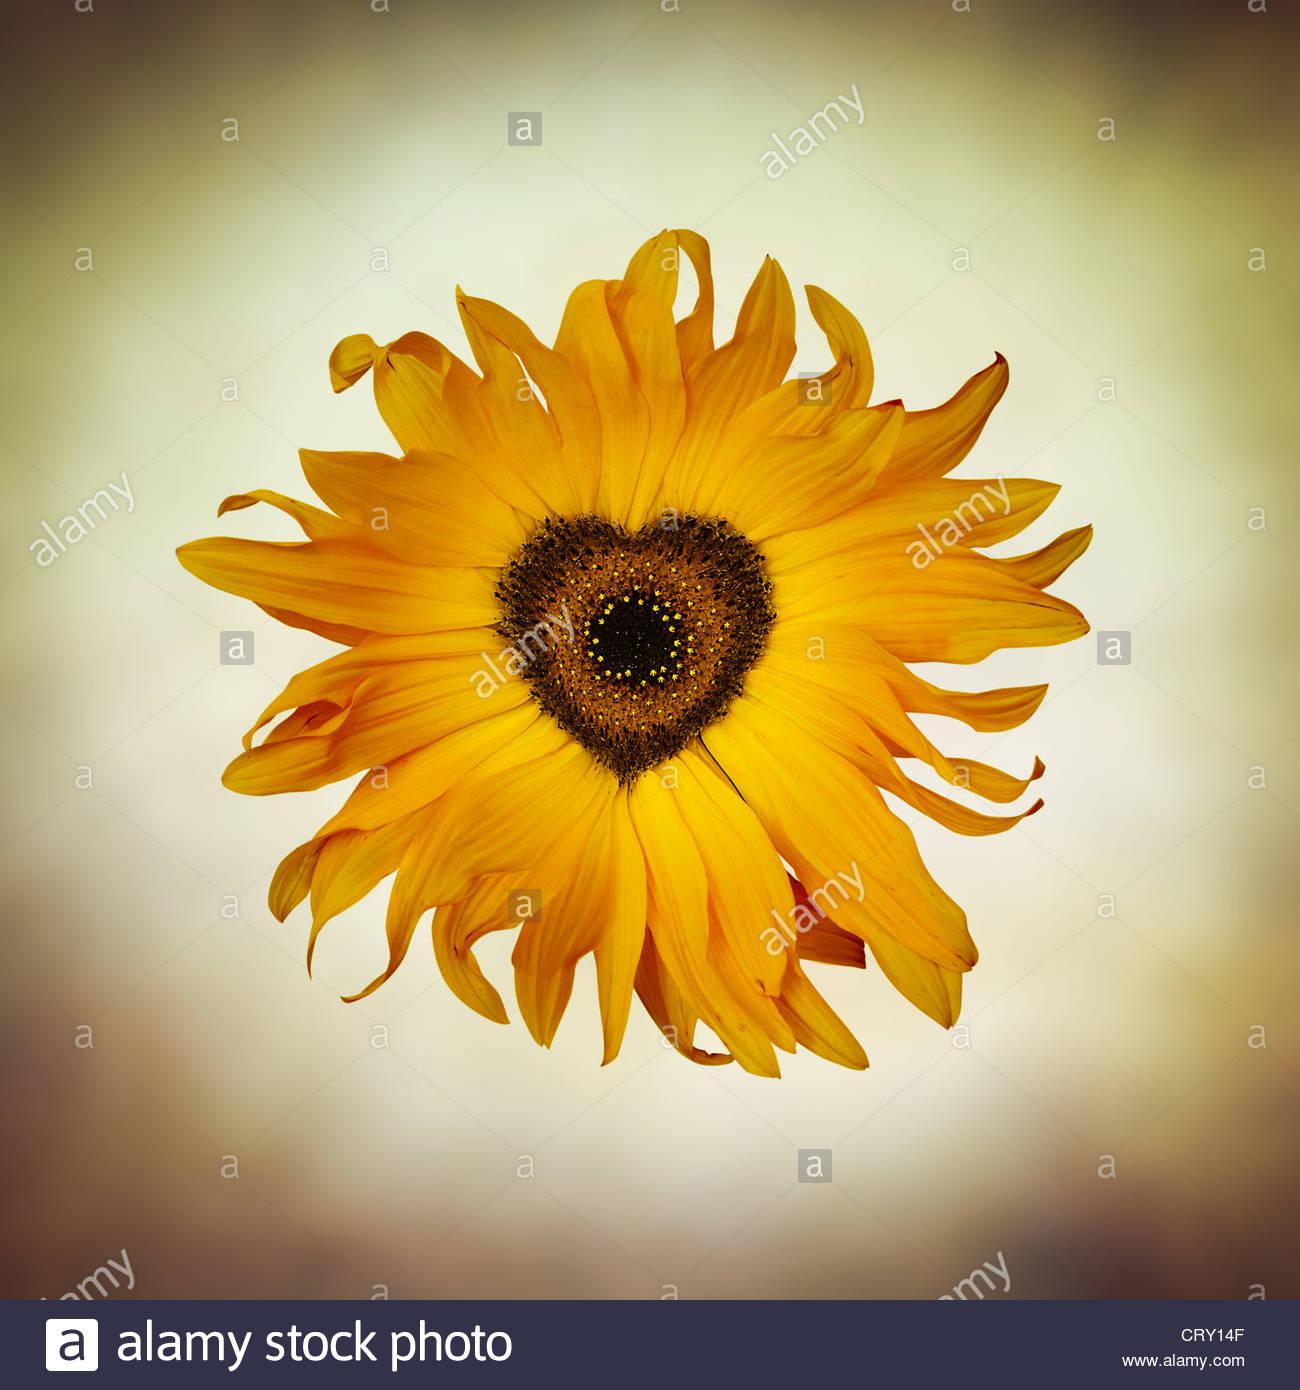 Sunflower Symbol Stock Photos Sunflower Symbol Stock Images Alamy